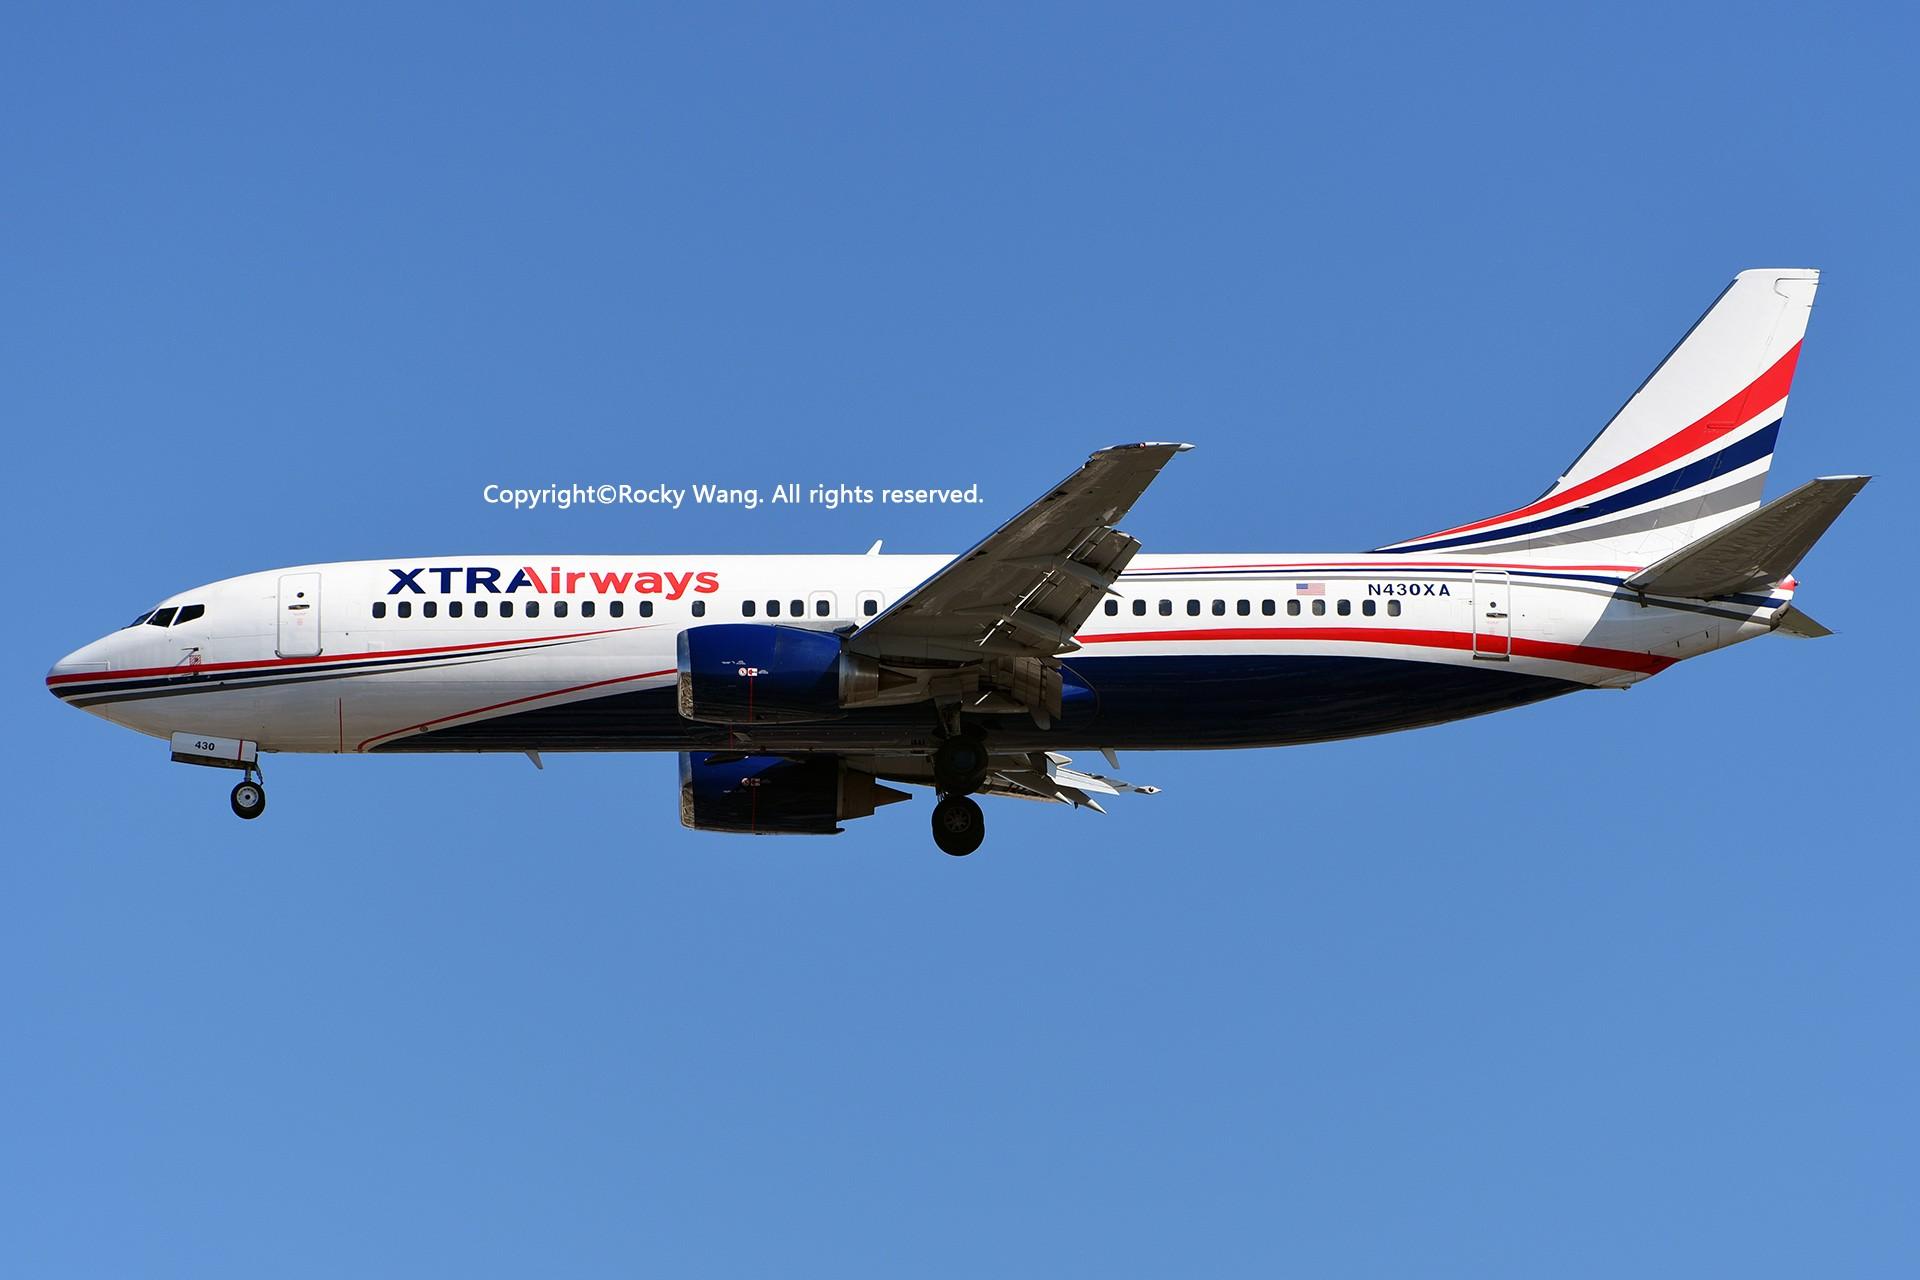 Re:[原创]KMIA 30图 BOEING 737-484 N430XA Miami Int'l Airport